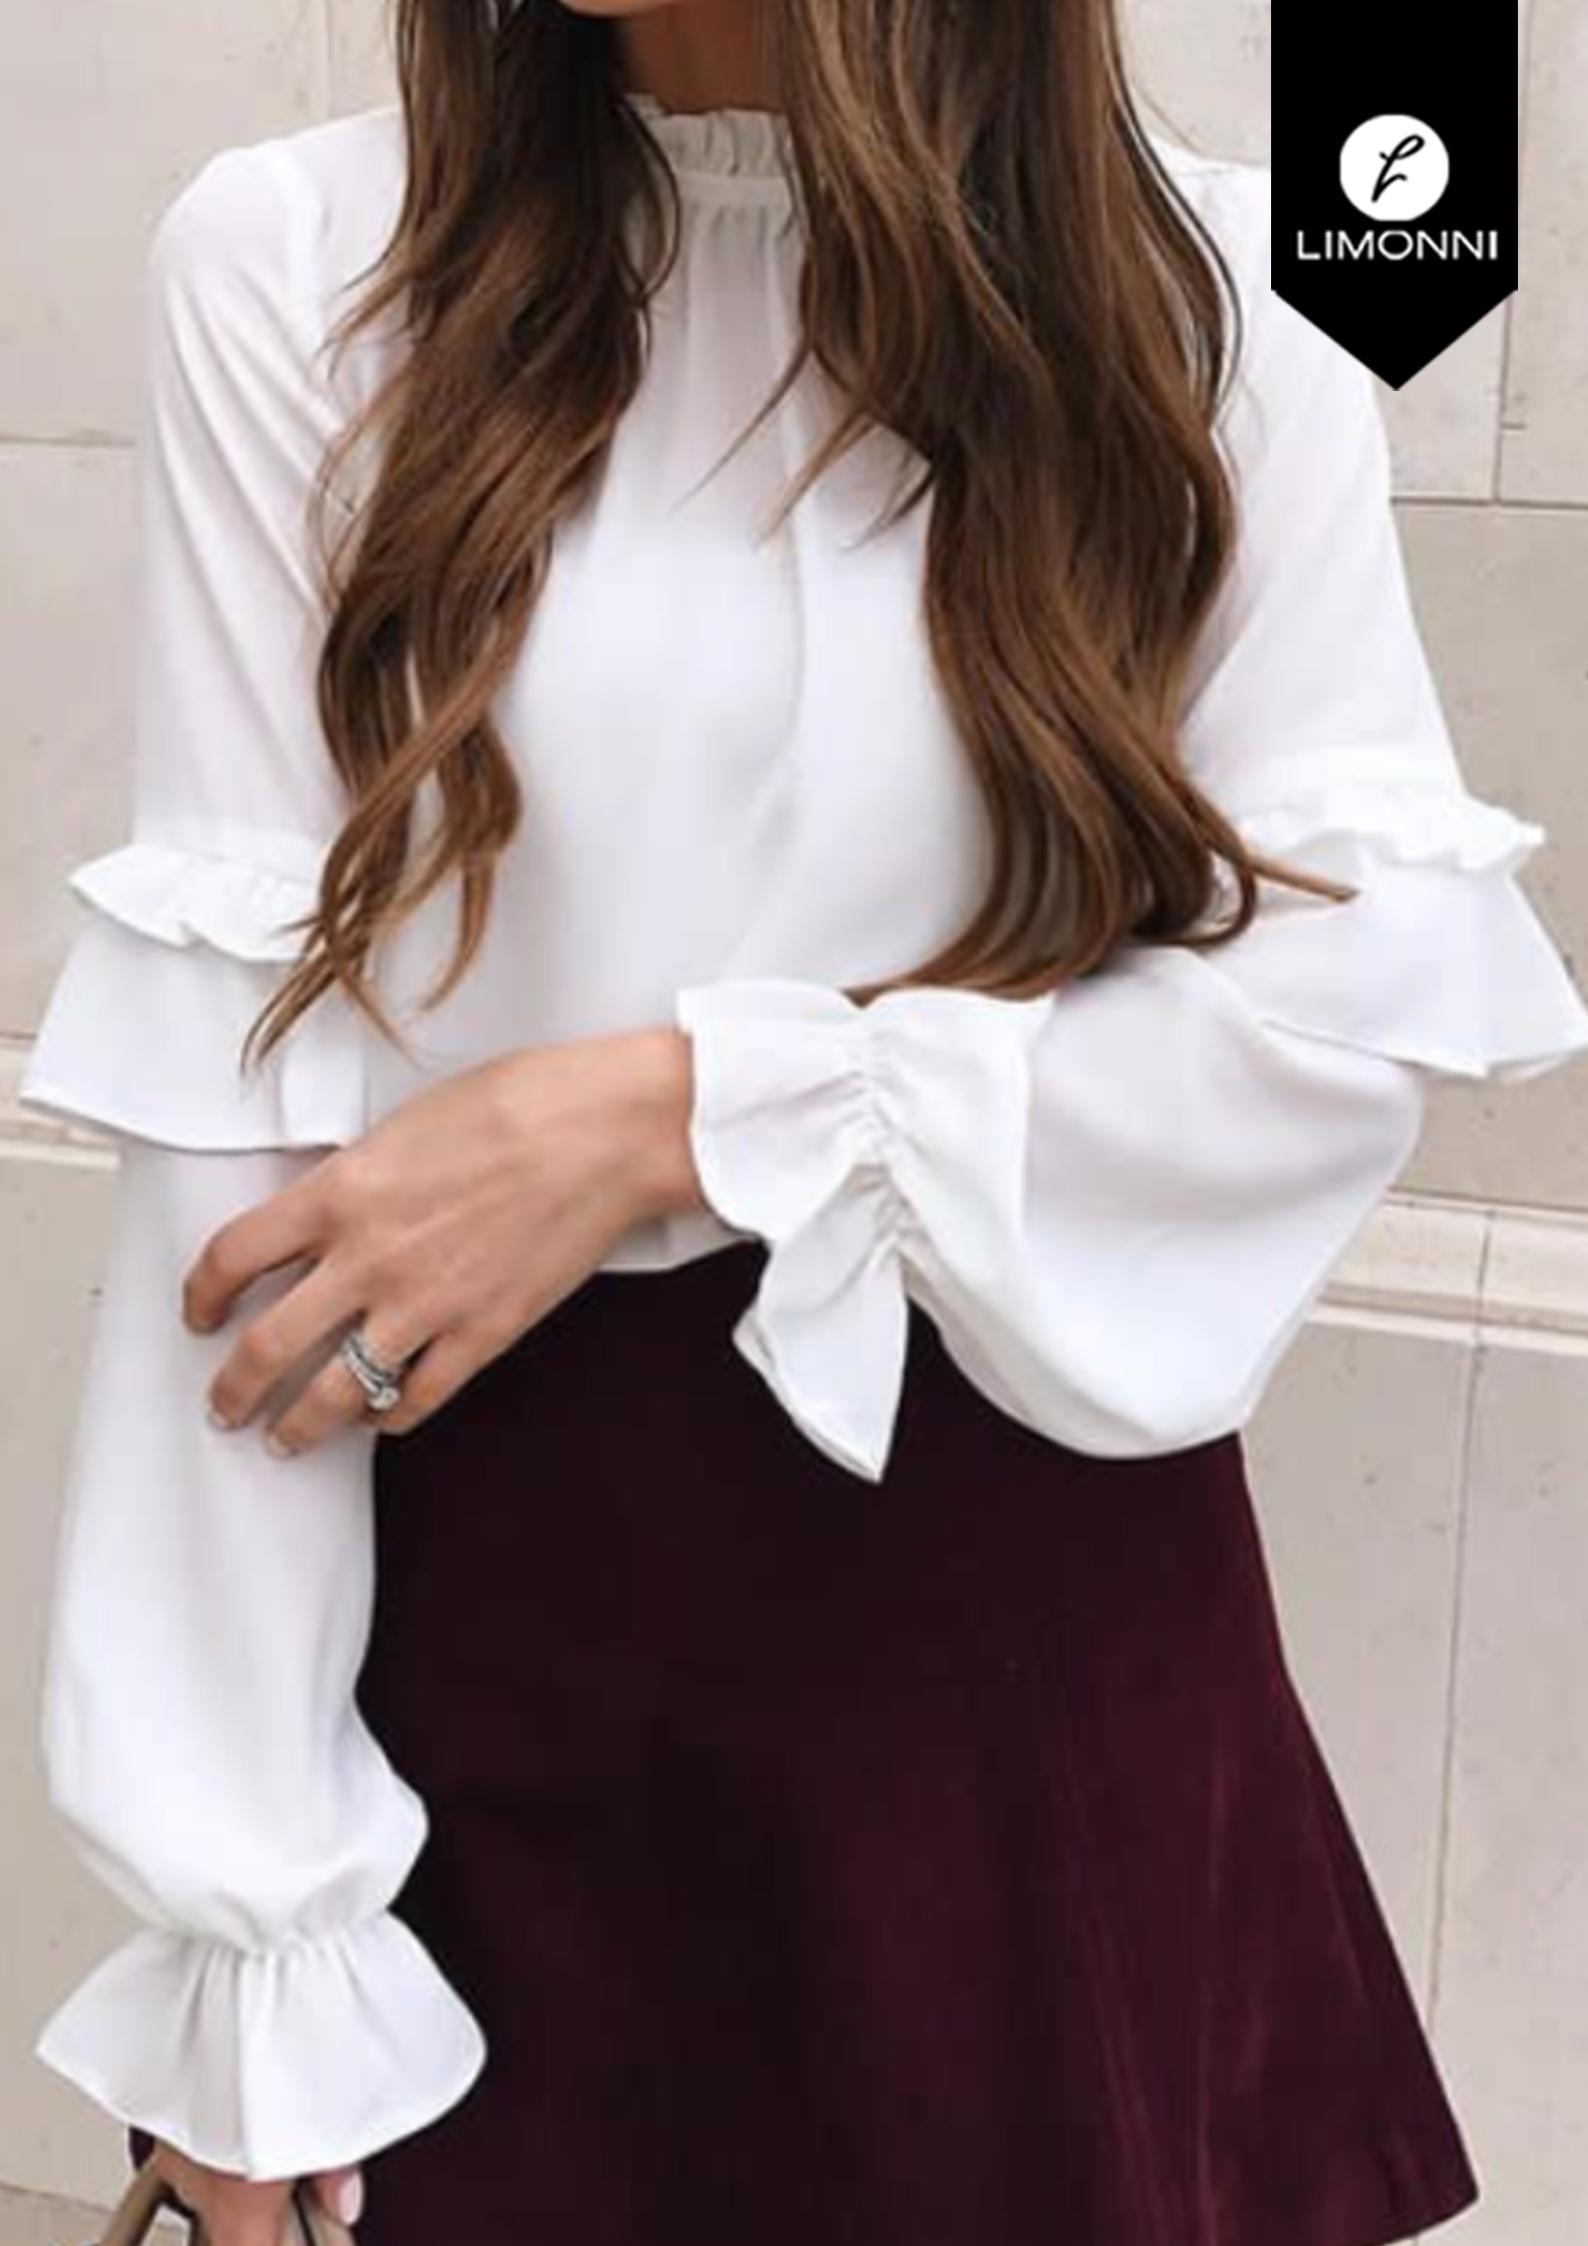 Blusas para mujer Limonni Bennett LI1285 Casuales